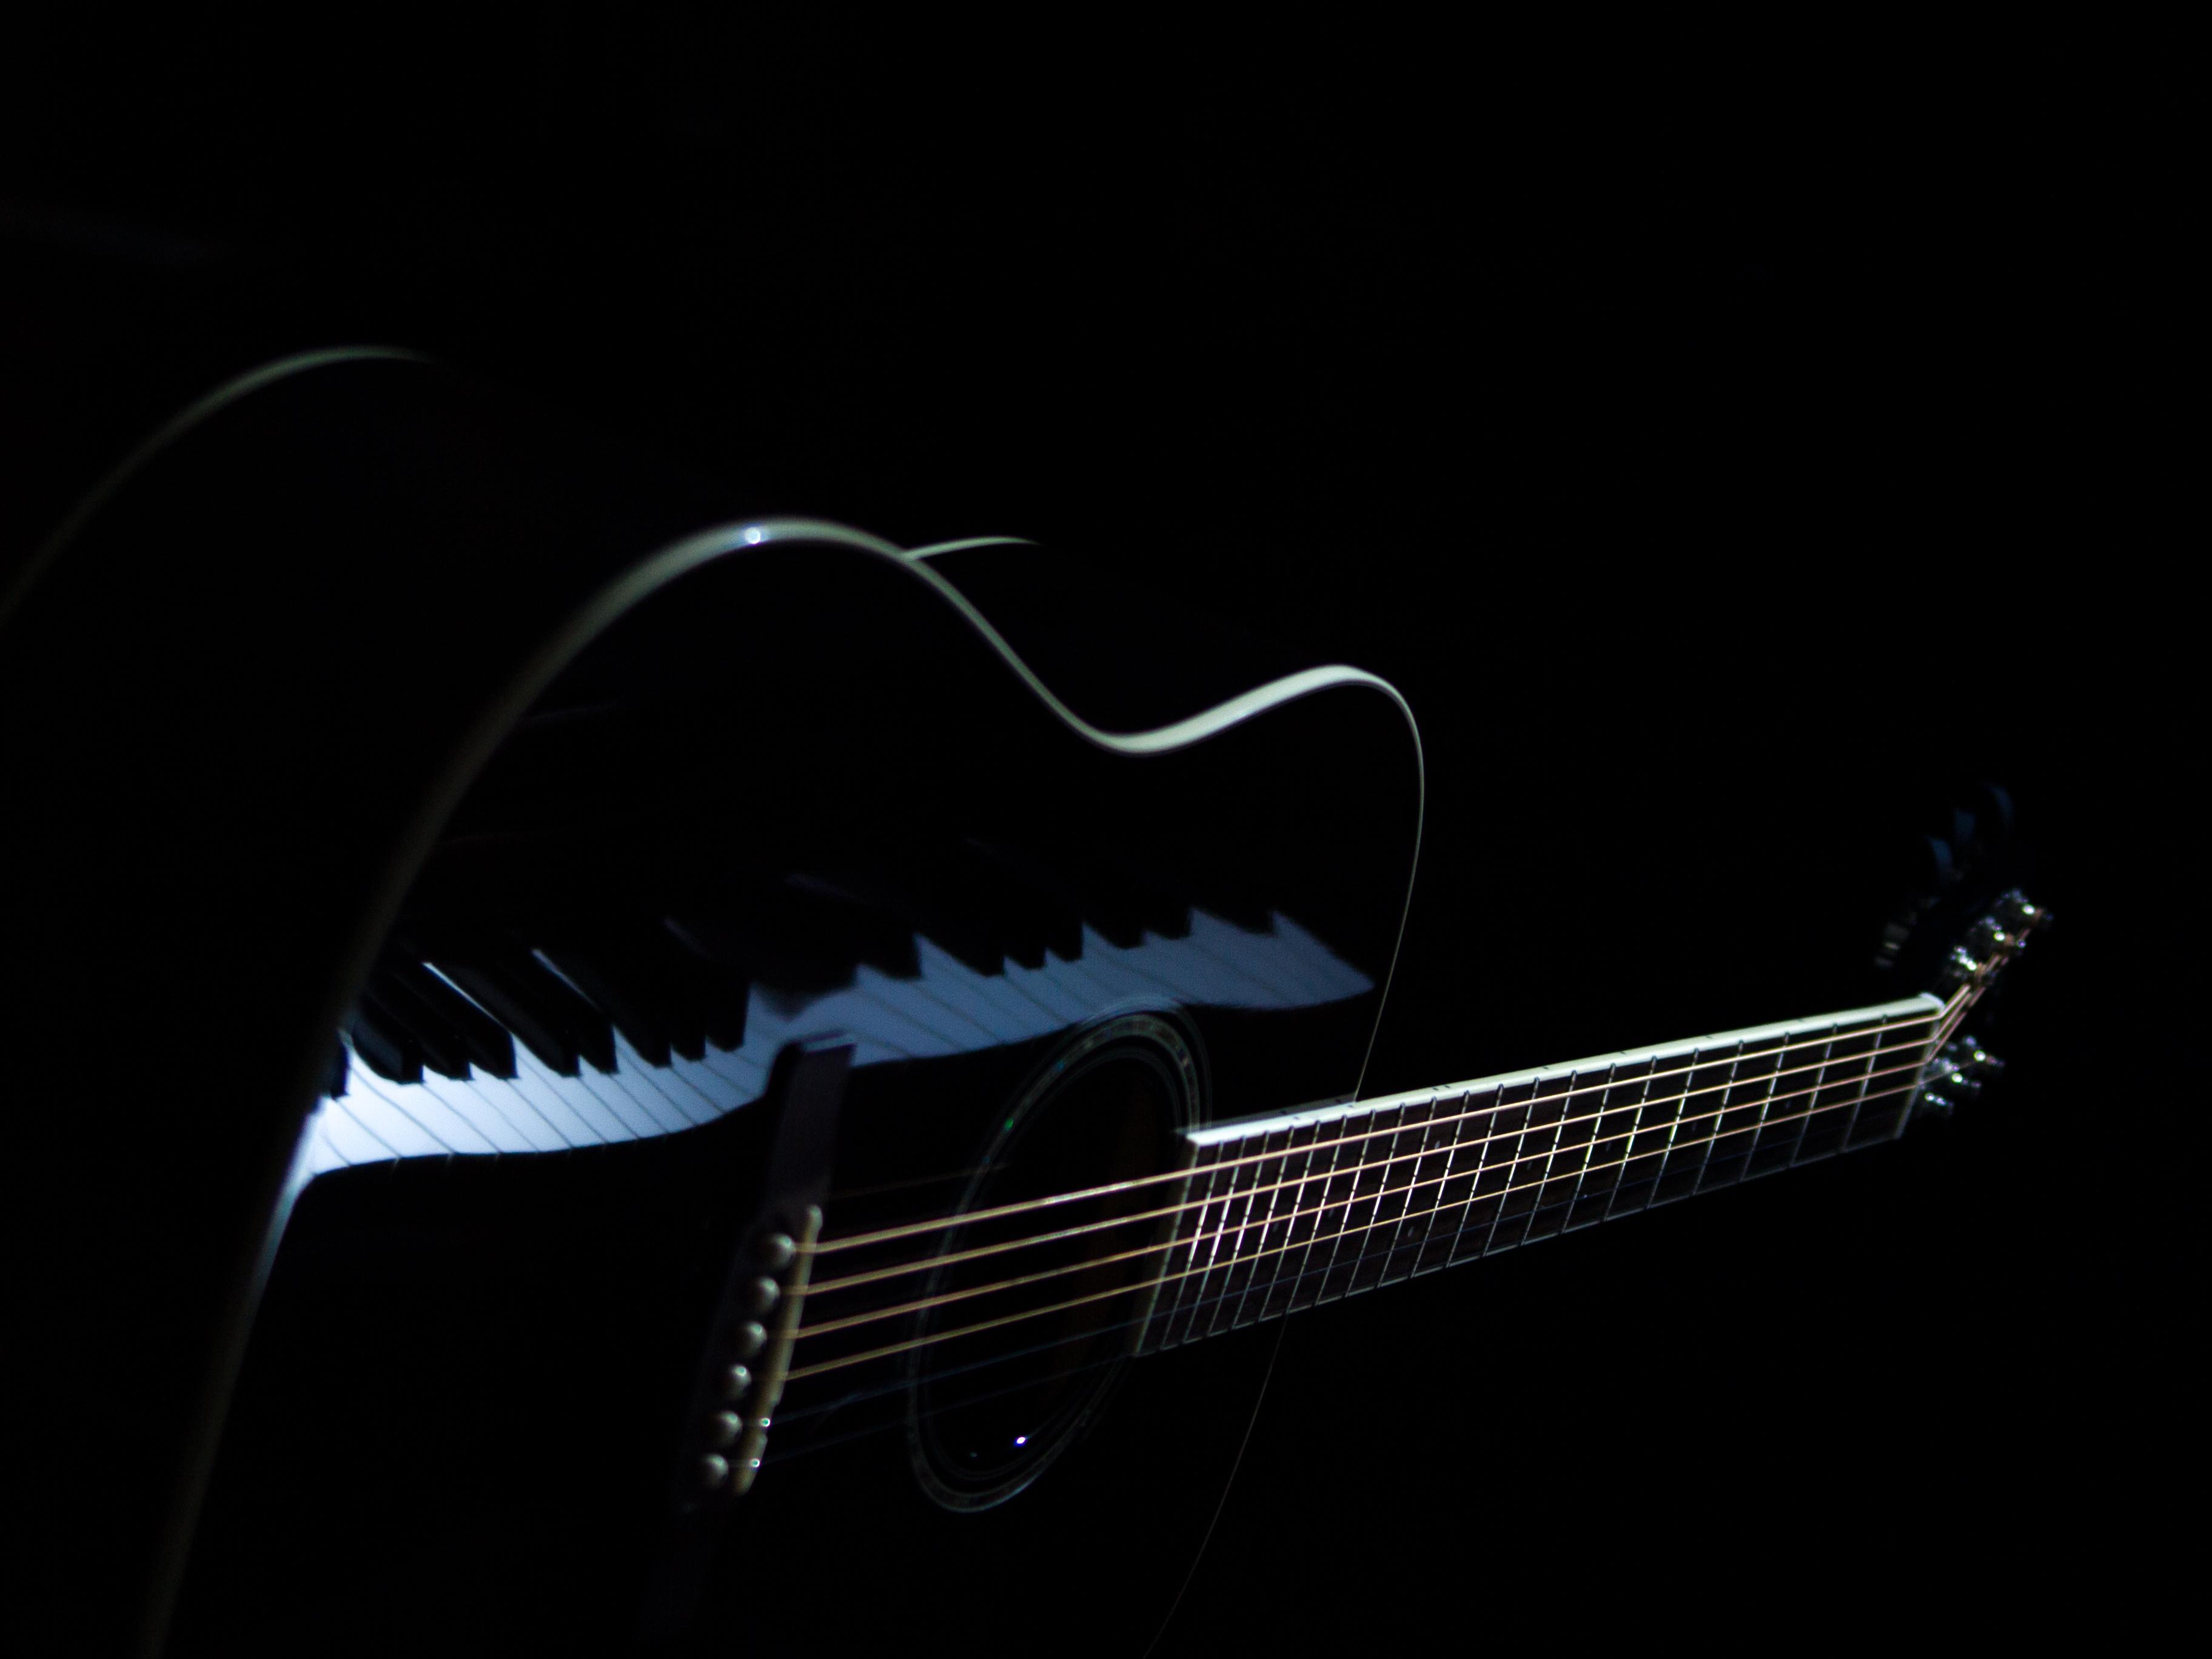 Beautiful Wallpaper Music Bright - light-music-white-abstract-black-reflection-ART-rock-dark-mirror-keyboard-key-shiny-artist-noir-shine-bright-artistic-guitar-folk-lumiere-curves-piano-culture-son-Olympus-pop-sparkle-Note-glossy-reflet-musical-reflect-sombre-sound-instrument-Yamaha-acoustic-string-mirrored-effect-audio-shining-blanc-zuiko-mirroir-polished-clavinova-musique-shimmer-cordes-clavier-guitare-artiste-briller-touche-frets-artistique-abstrait-Dreadnought-effet-70mm-stringed-brillant-vernis-courbes-acoustique-brillance-refl-ter-laqu-e520-miroiter-cortearth100-amorusomarc-marcodeco-928939  Trends_472182.jpg